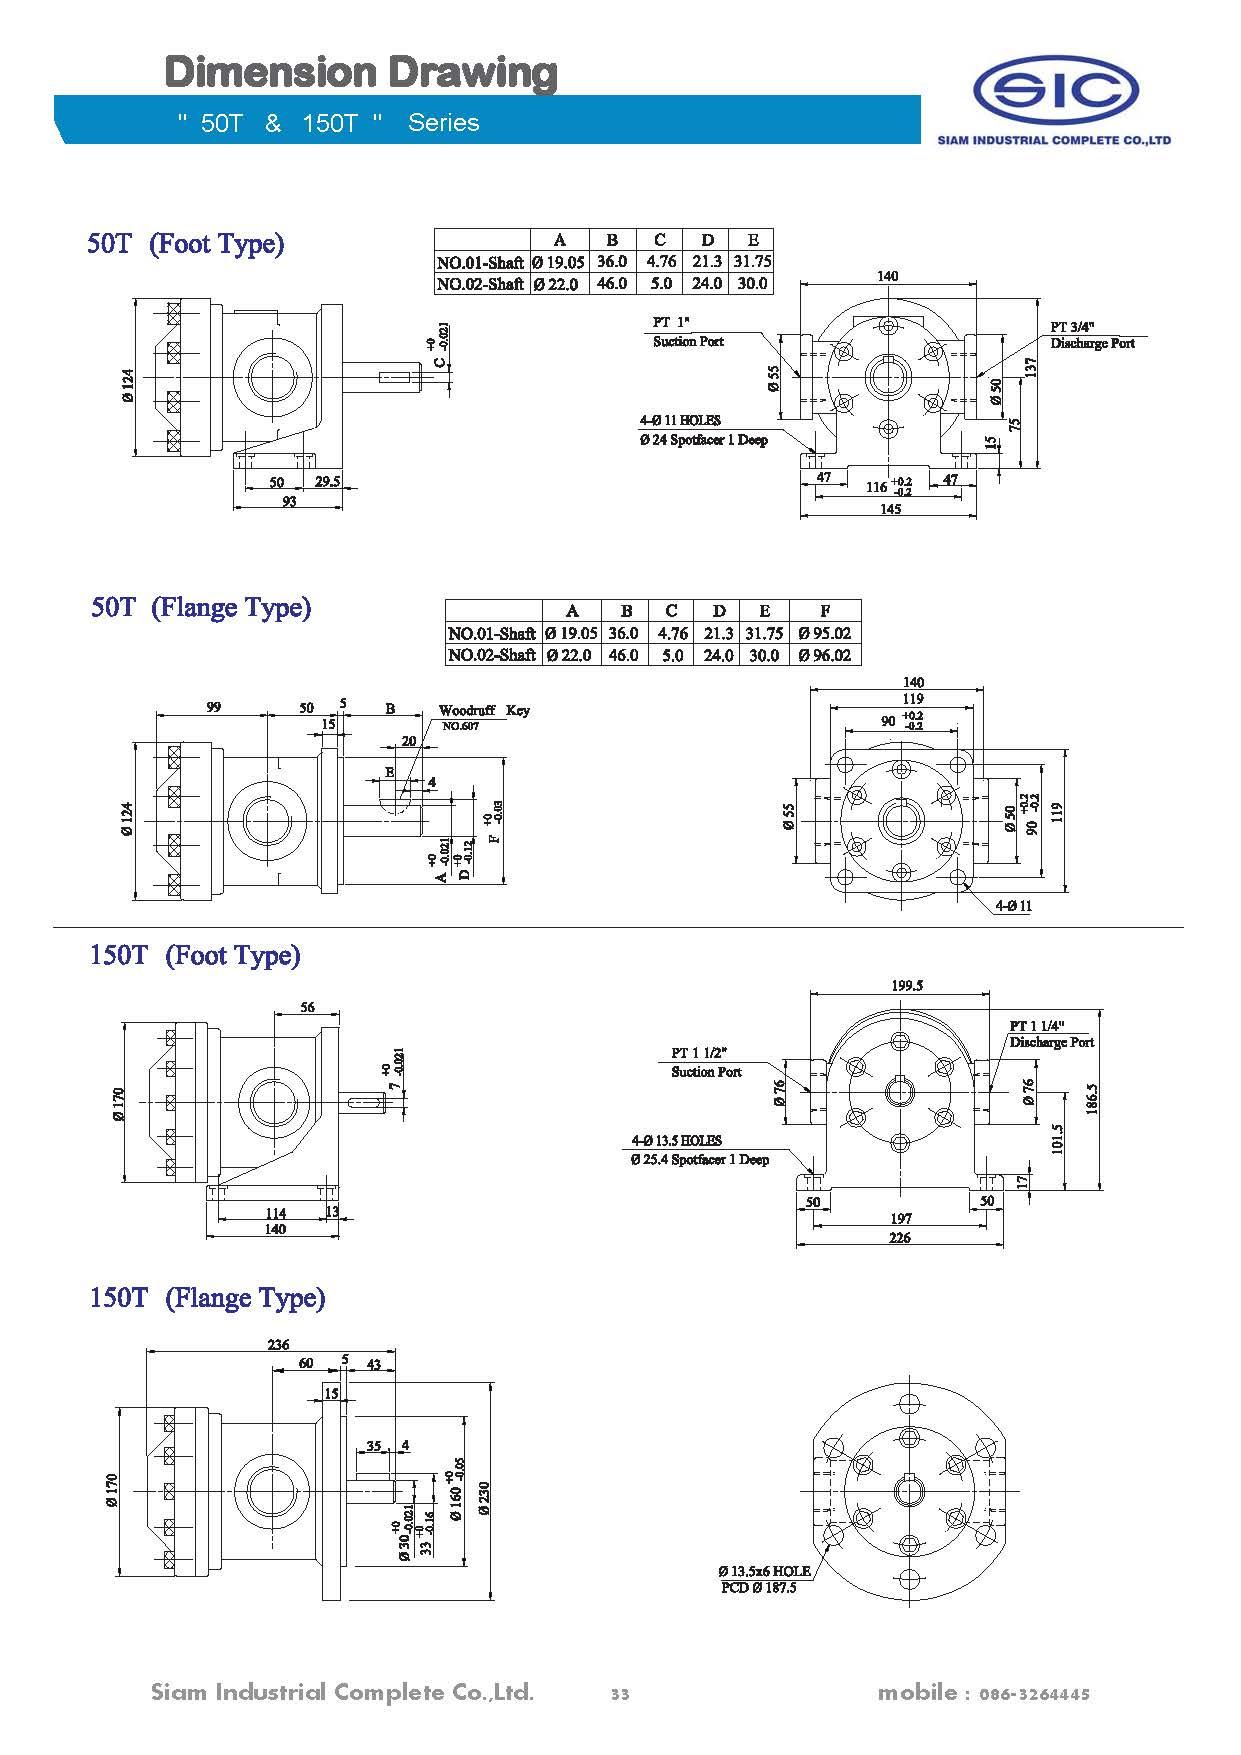 150t 61 L Rl150t 75 116 Rl Vane Pump Hydraulic Siam Diagram Fix Series Working Pressure 70kgf Cm2 70 611cc Rev 14500 749cc